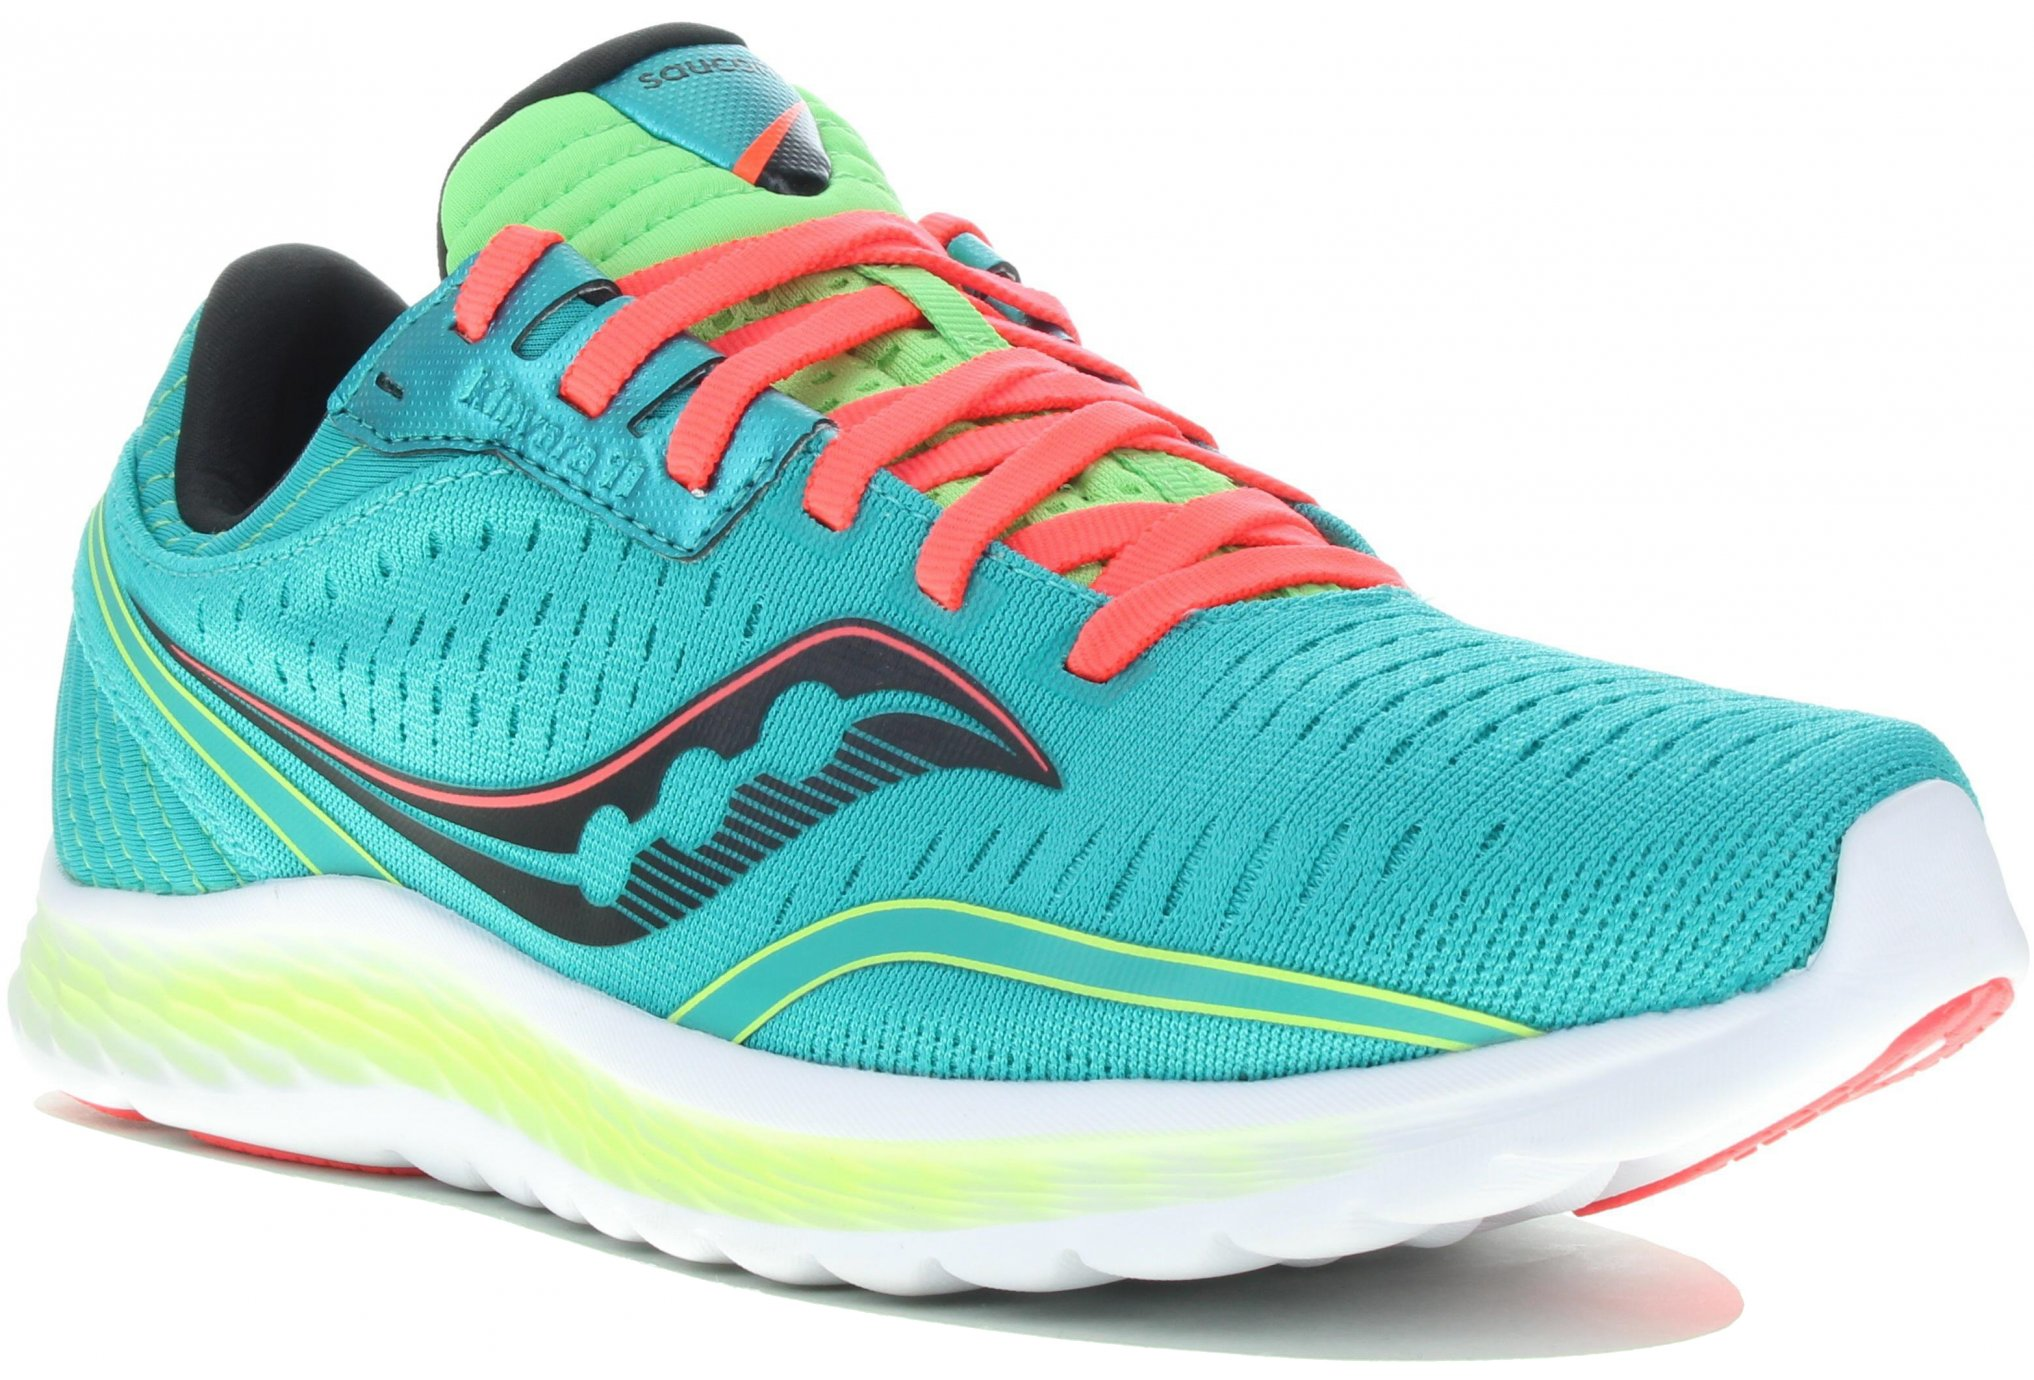 Saucony Kinvara 11 W Chaussures running femme